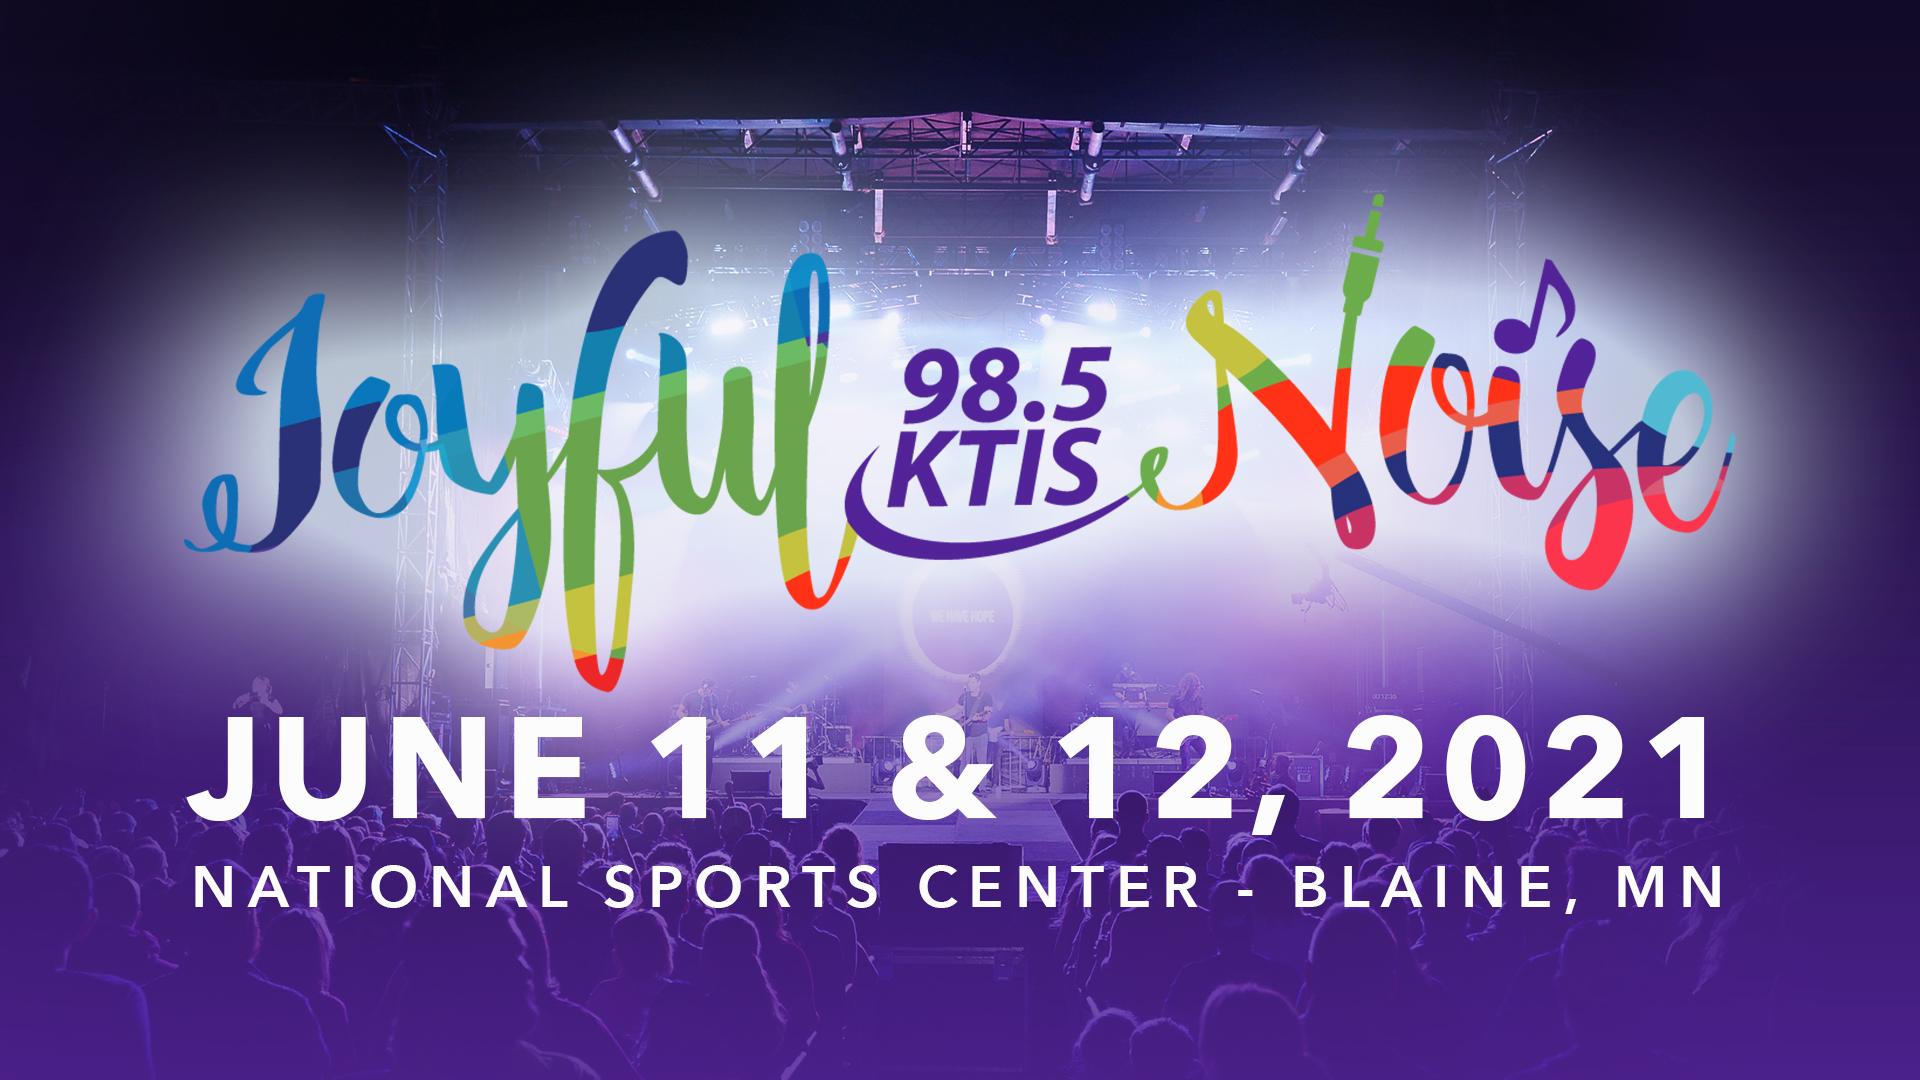 Joyful Noise - June 11 & 12, 2021. National Sports Center, Blaine, MN